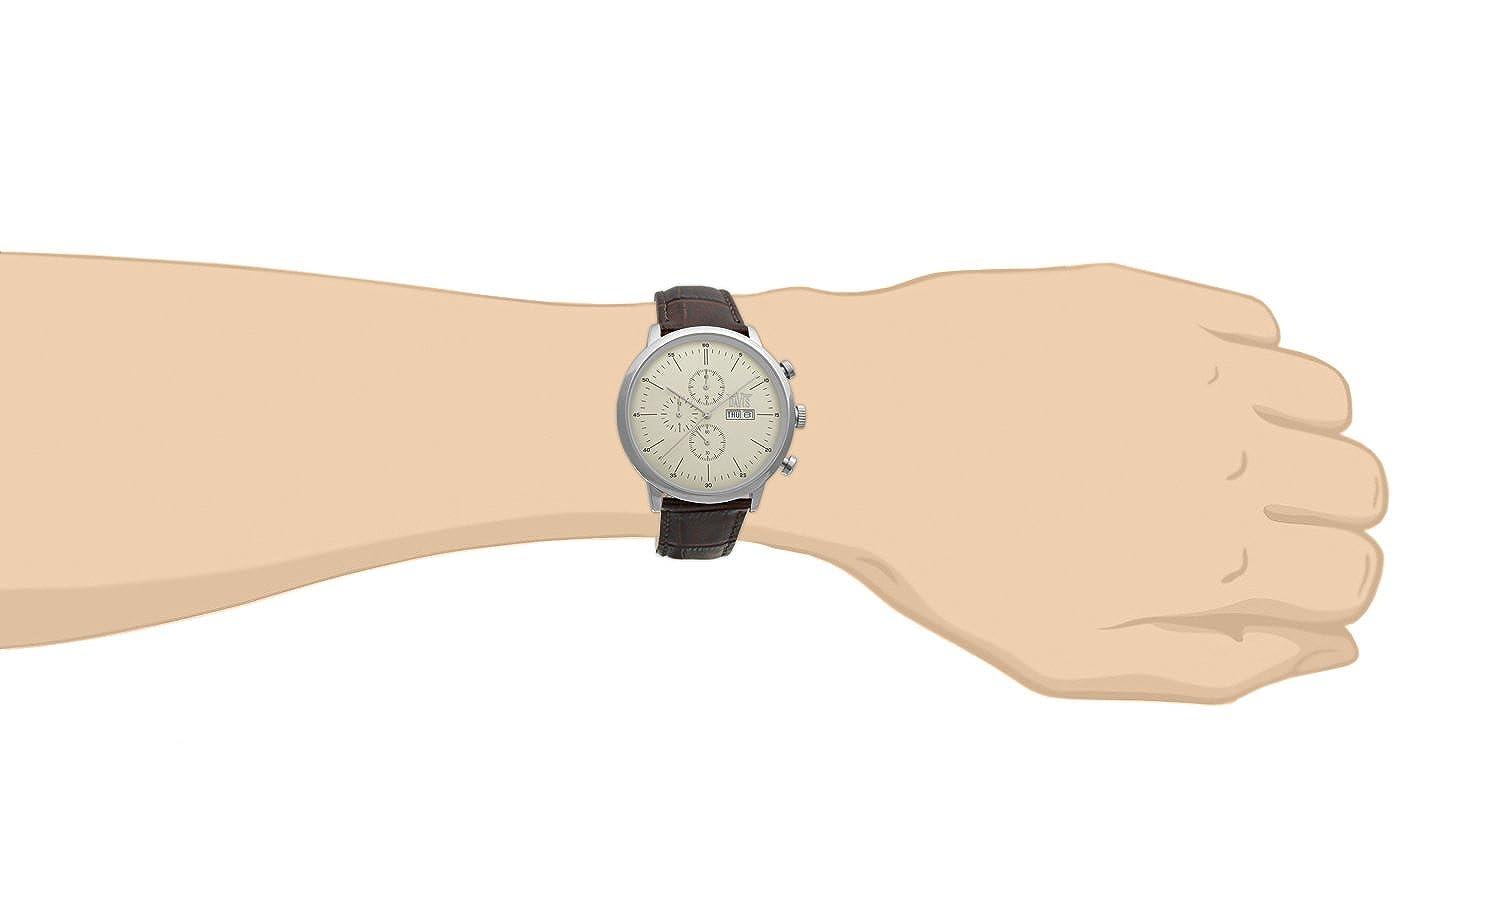 4ea670208021 Davis 1950- Reloj retro clasico para hombre